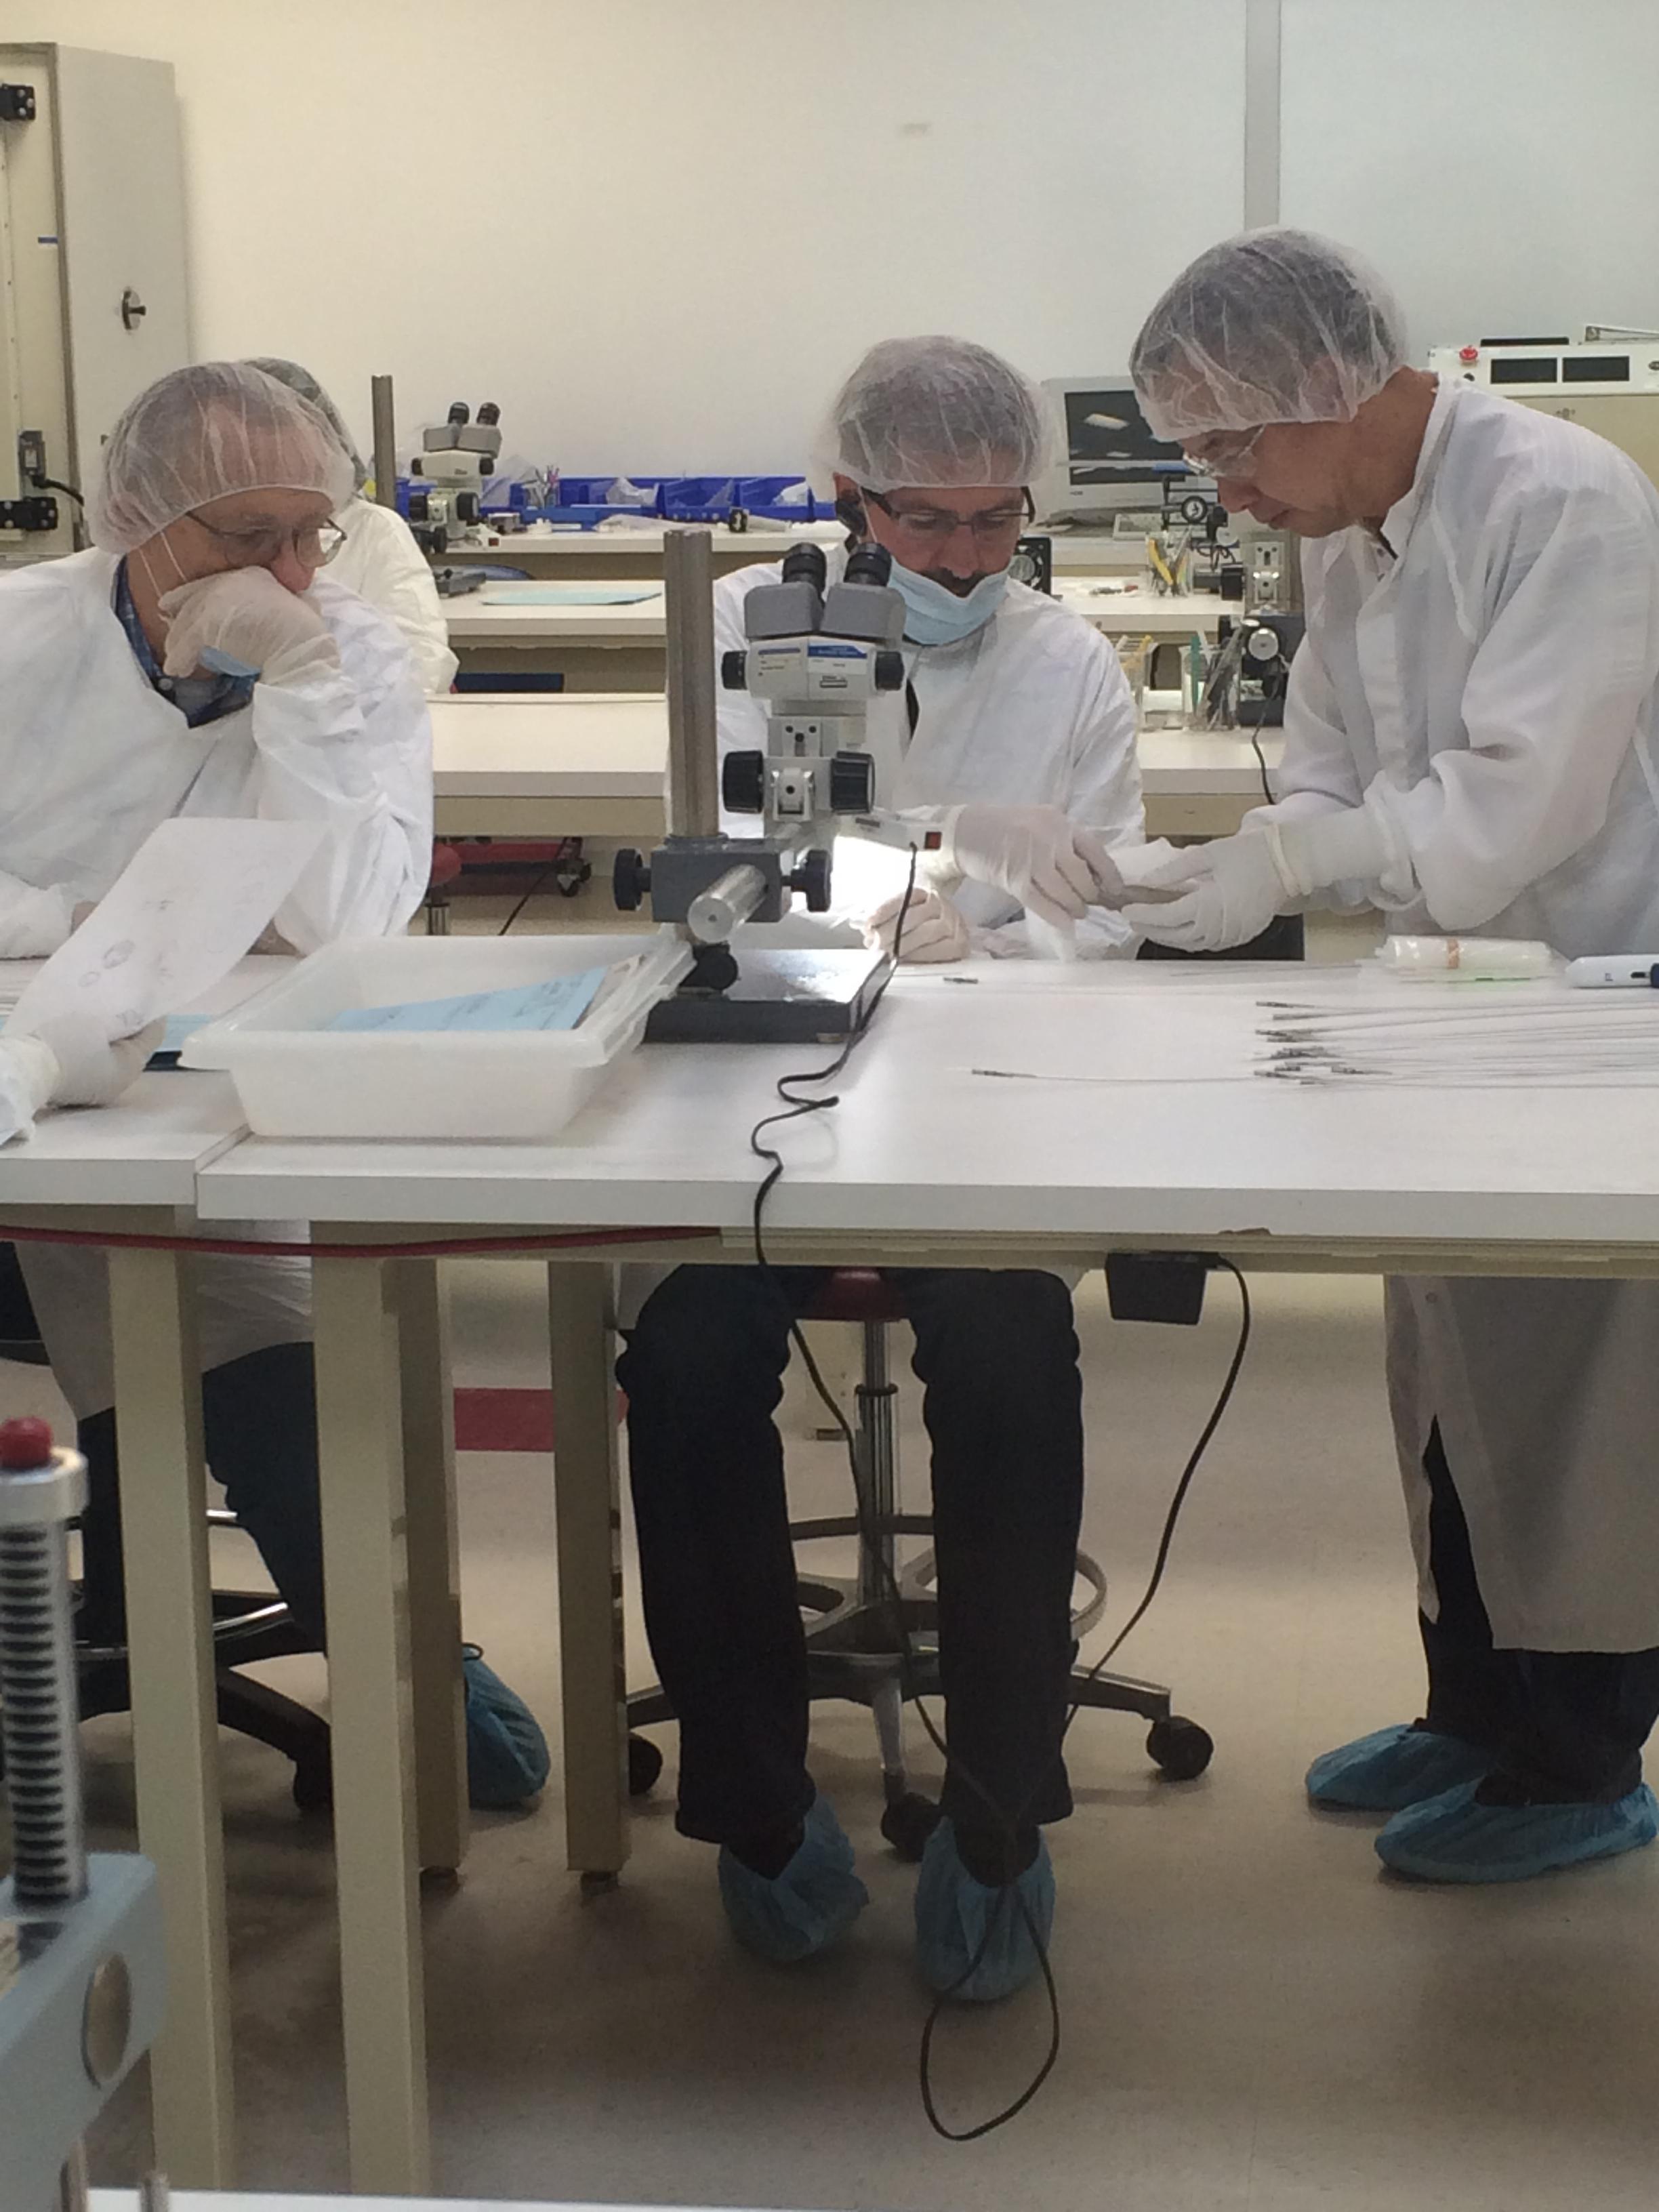 Endoscopy Cleaning Room: Anthony Nobles Enterprises